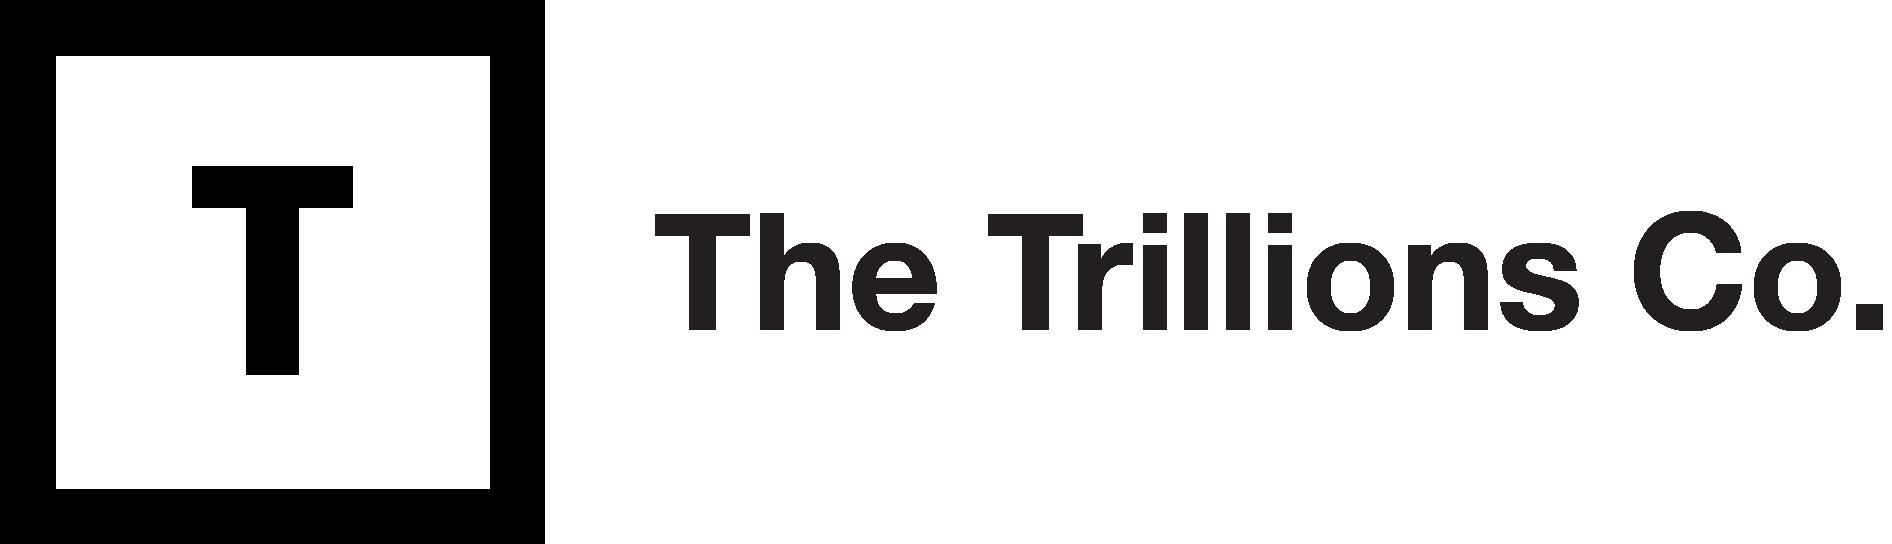 Trillions_logo_black.png